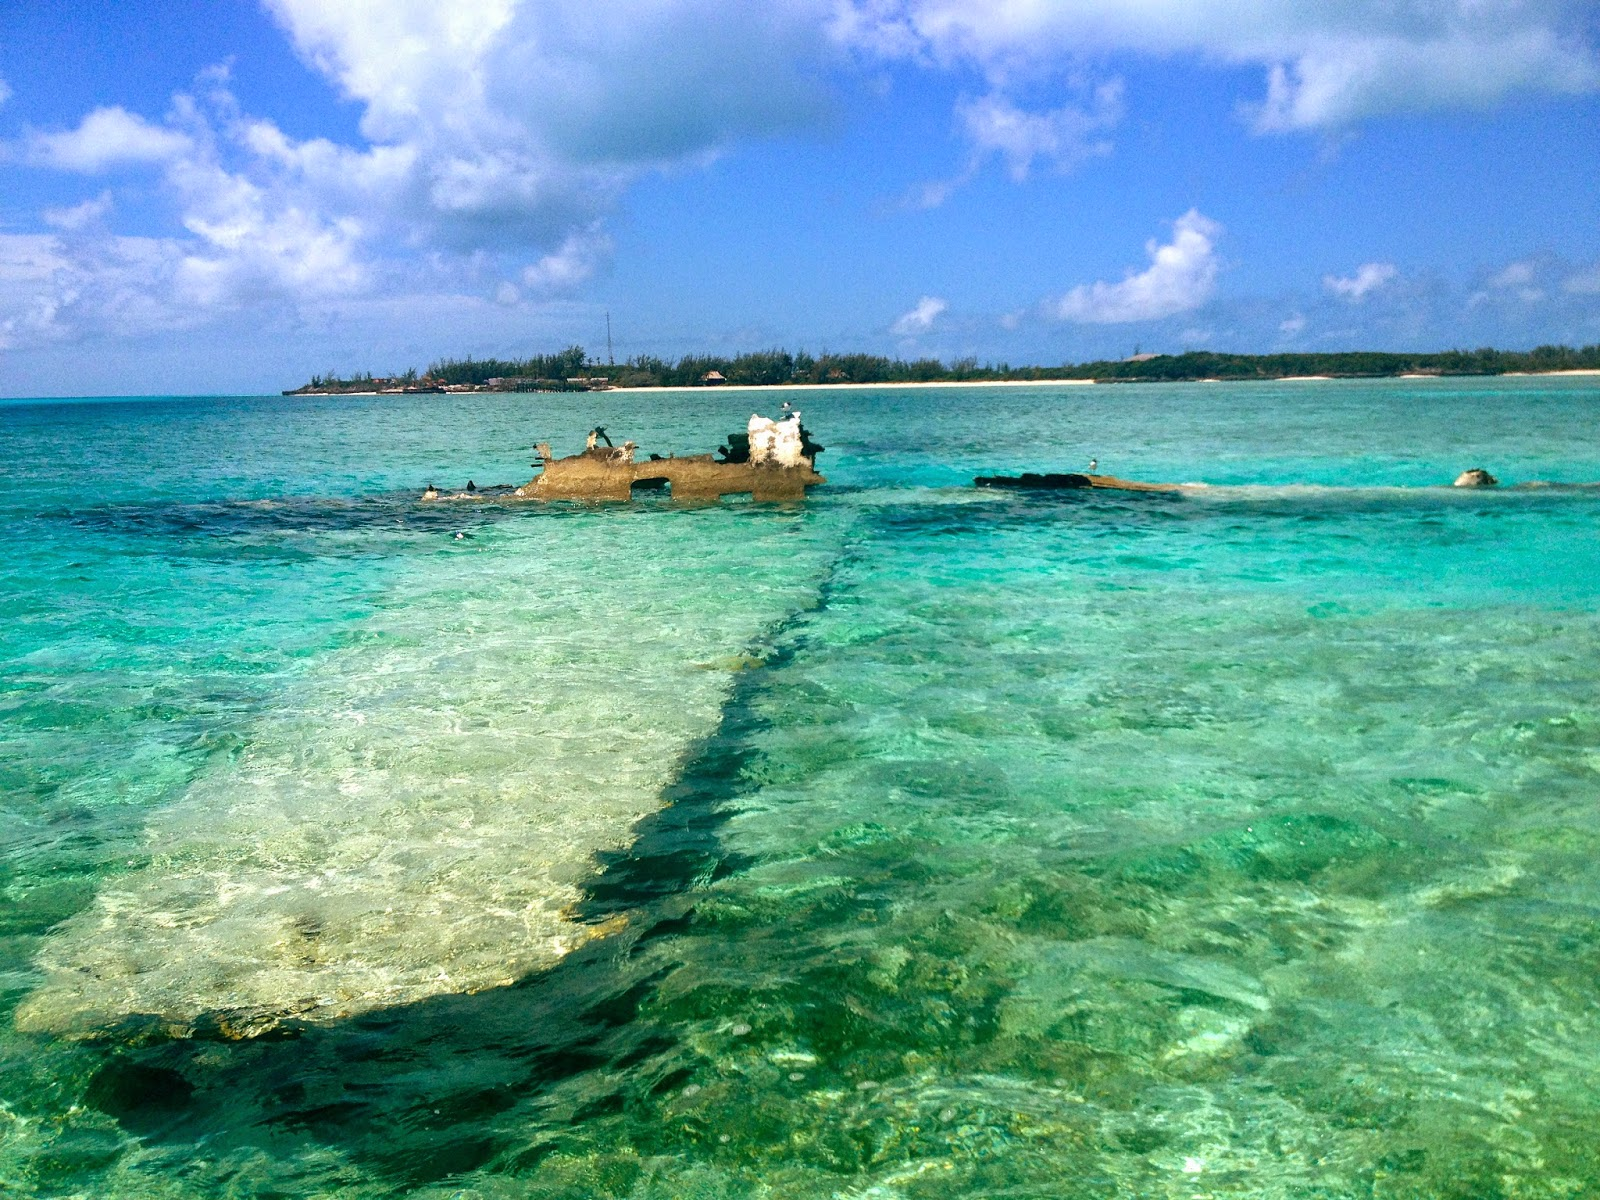 Noleggio Barche Allen's Cay - Navalia | Noleggia un Sogno